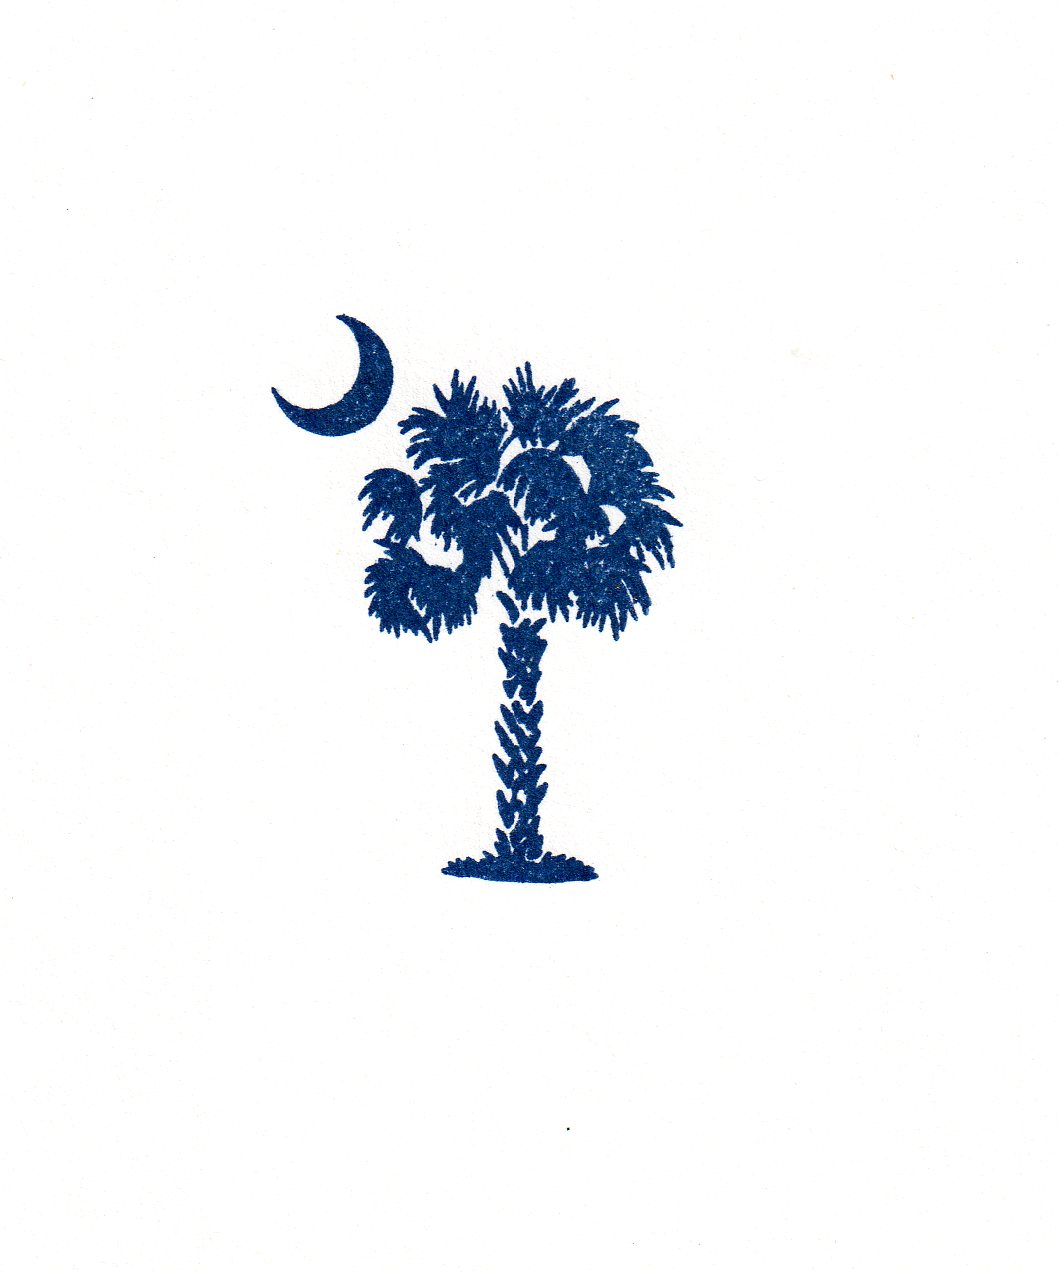 South Carolina clipart #5, Download drawings